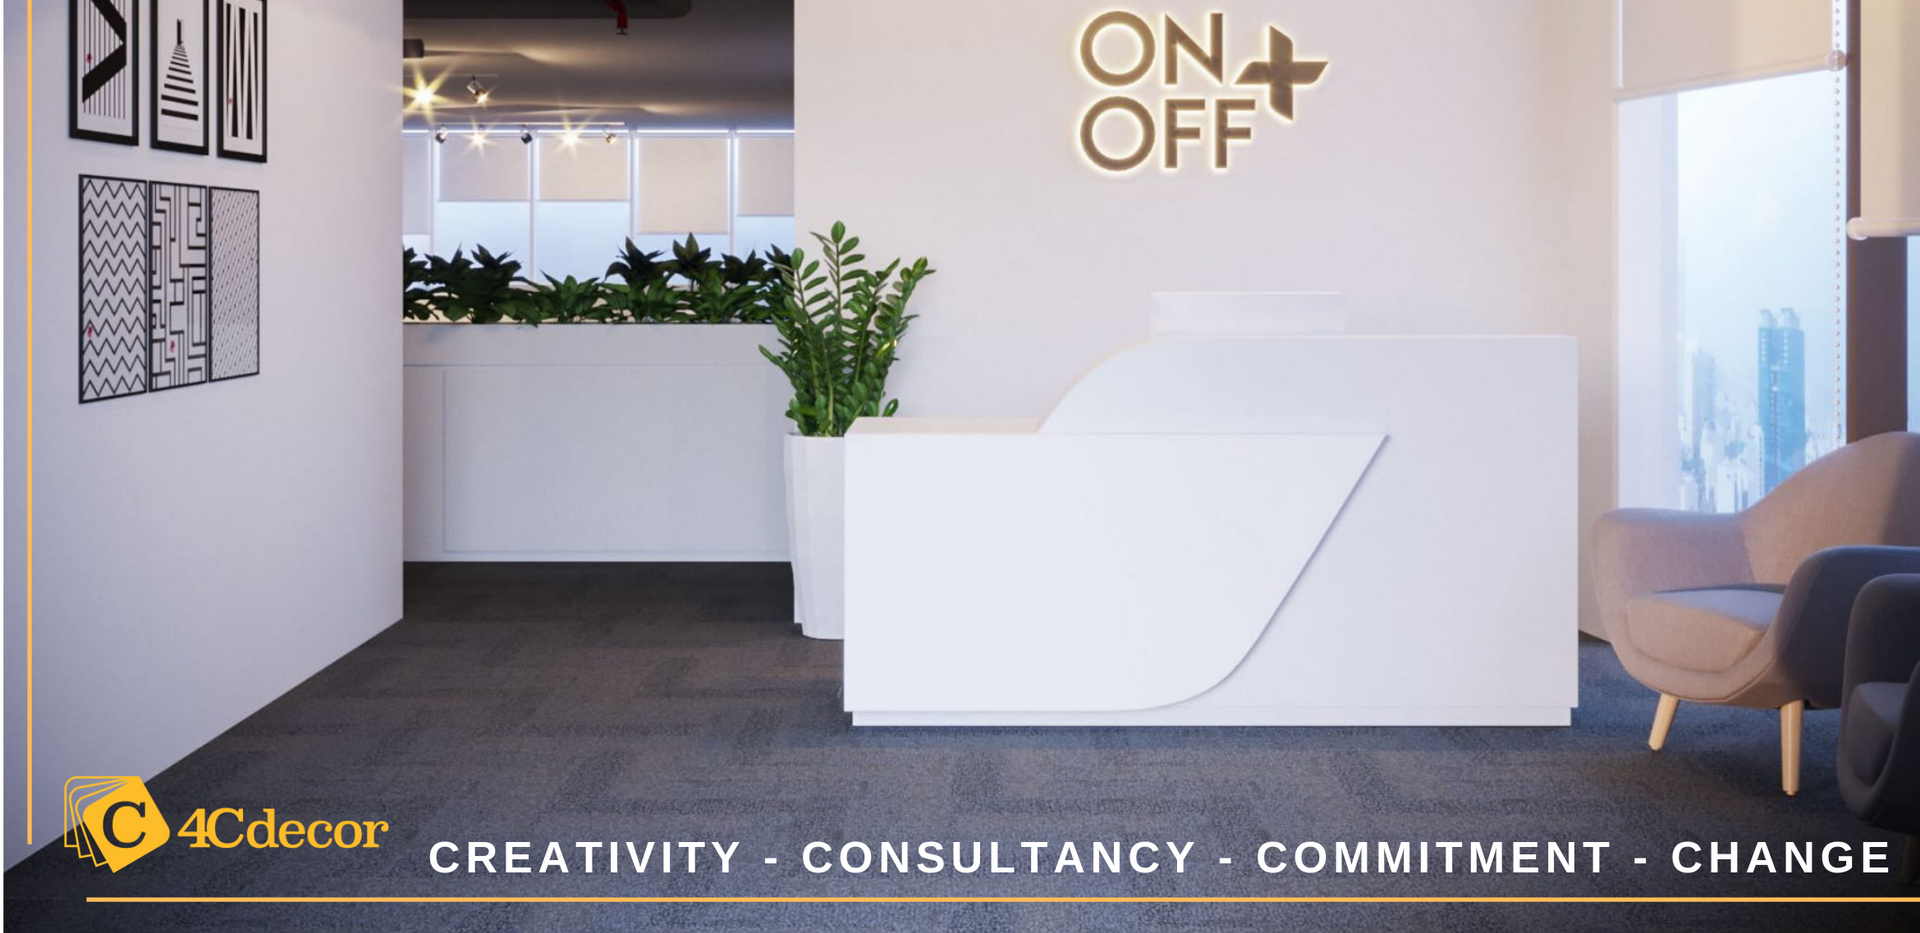 Creativity - Consultancy - Commitment -